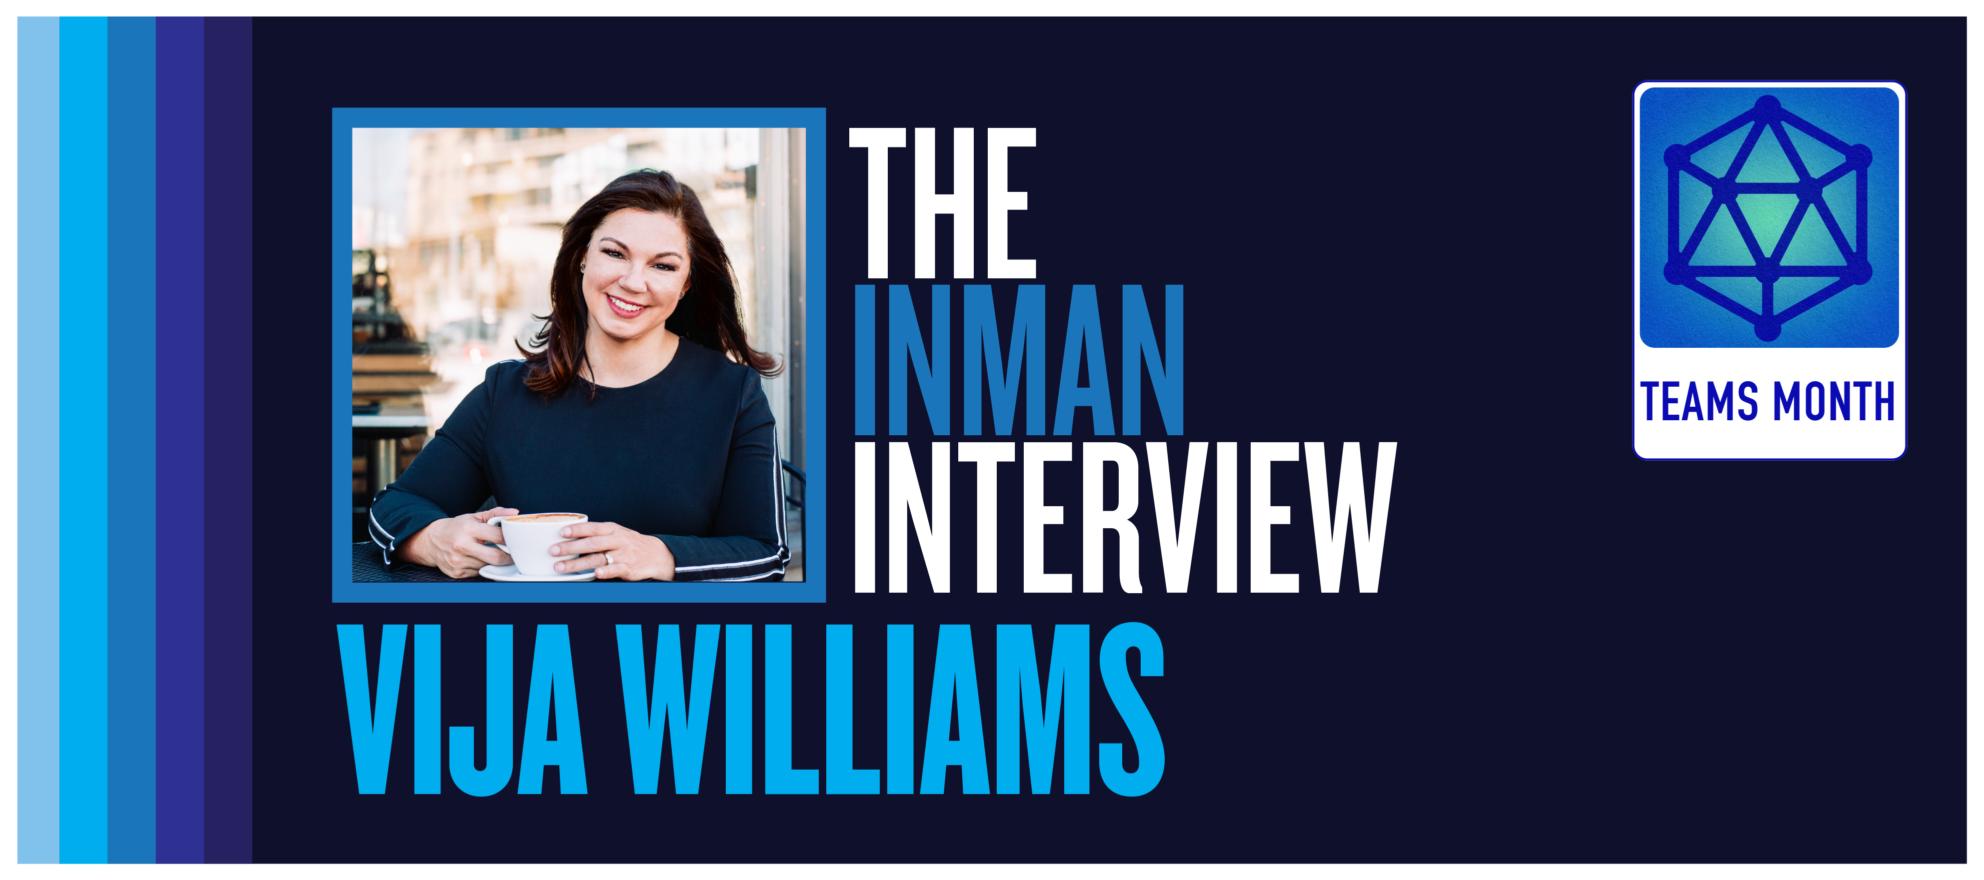 'Teams are the exciting future of real estate': Vija Williams